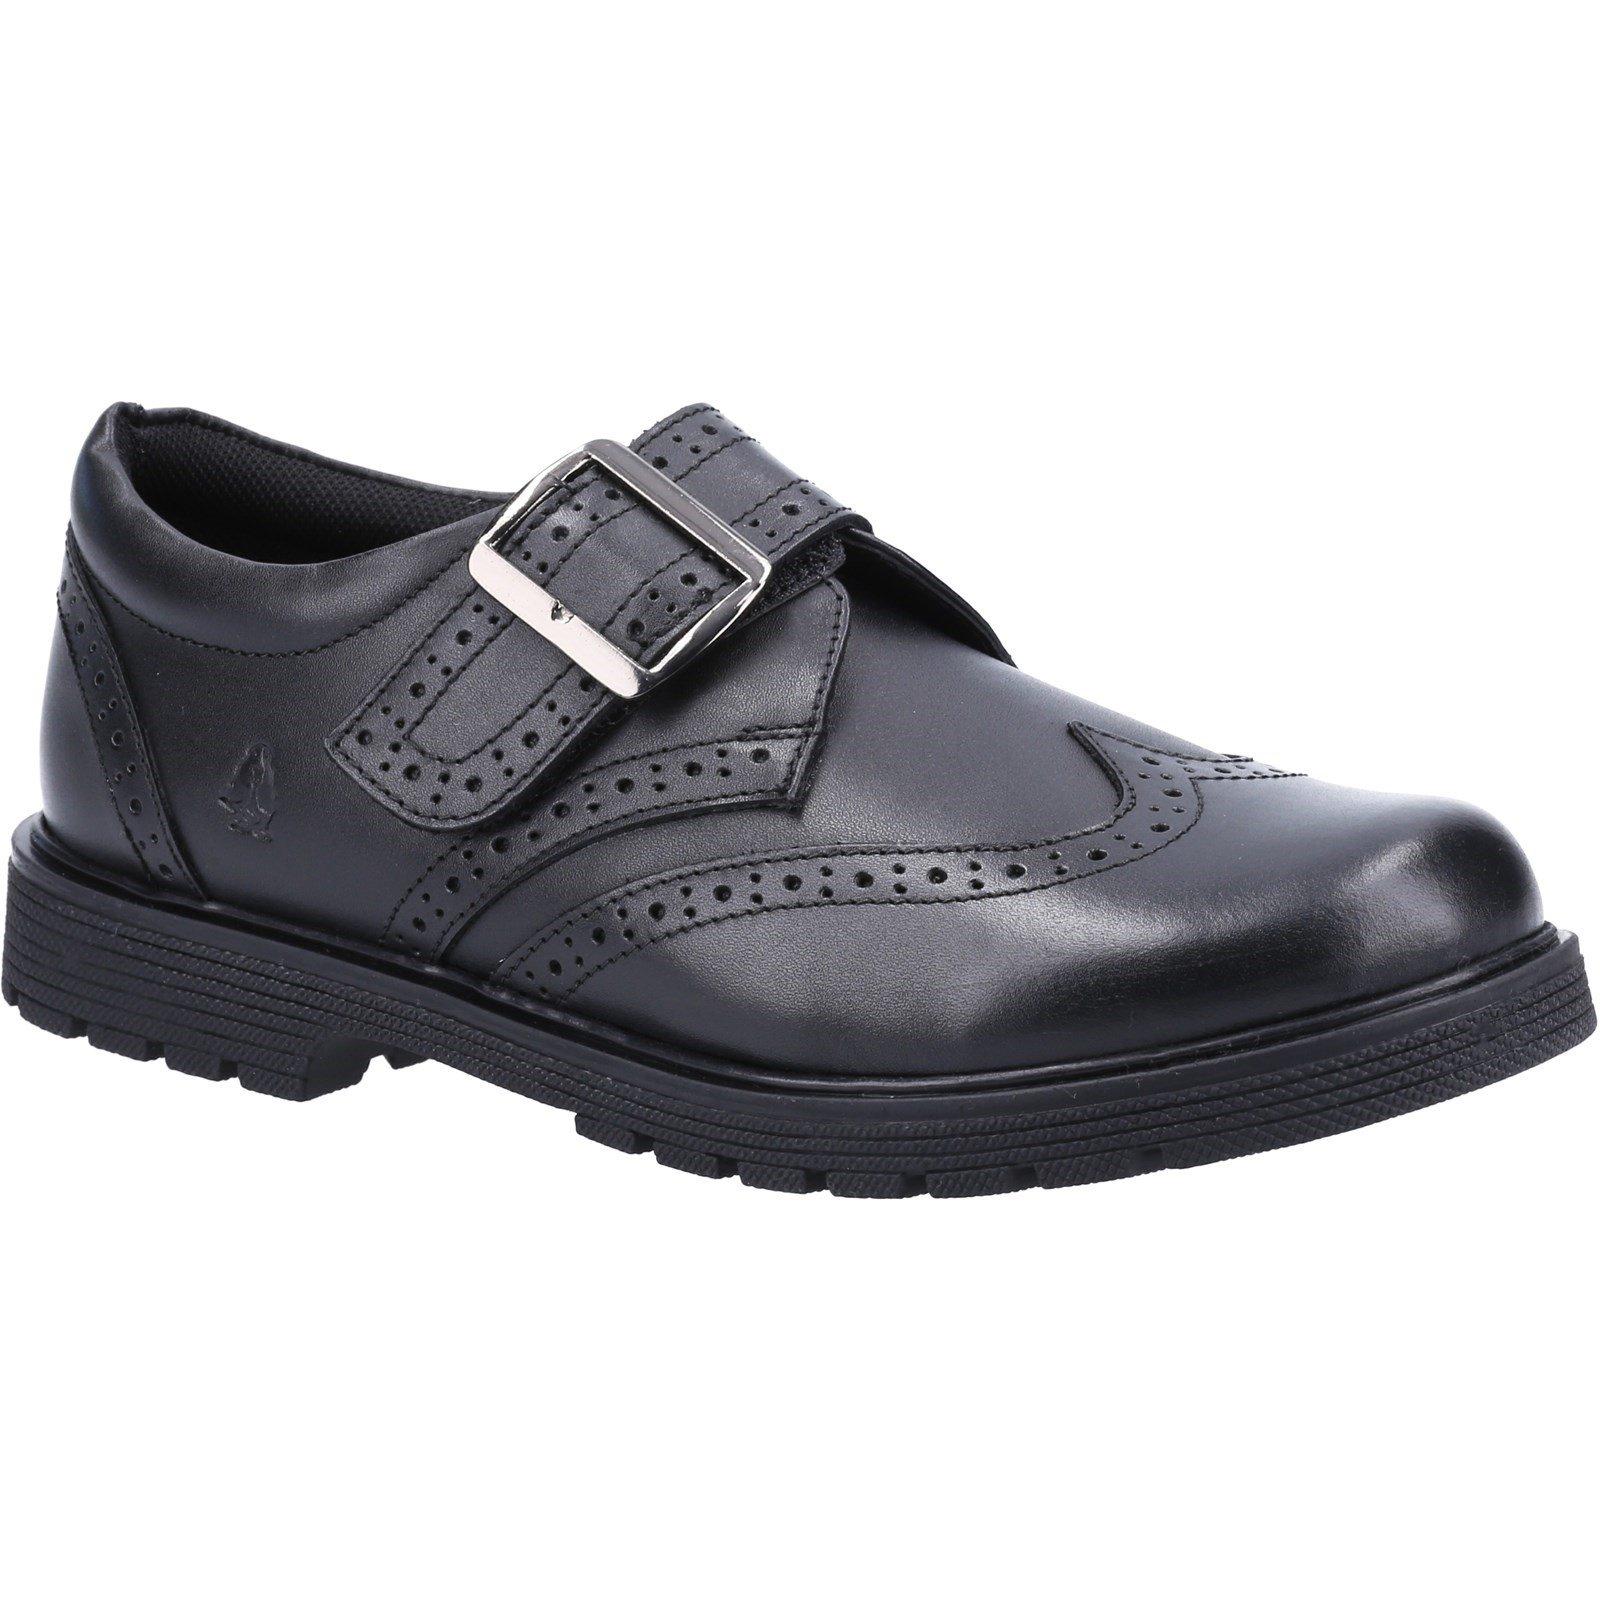 Hush Puppies Kid's Rhiannon Junior School Shoe Black 32625 - Black 1